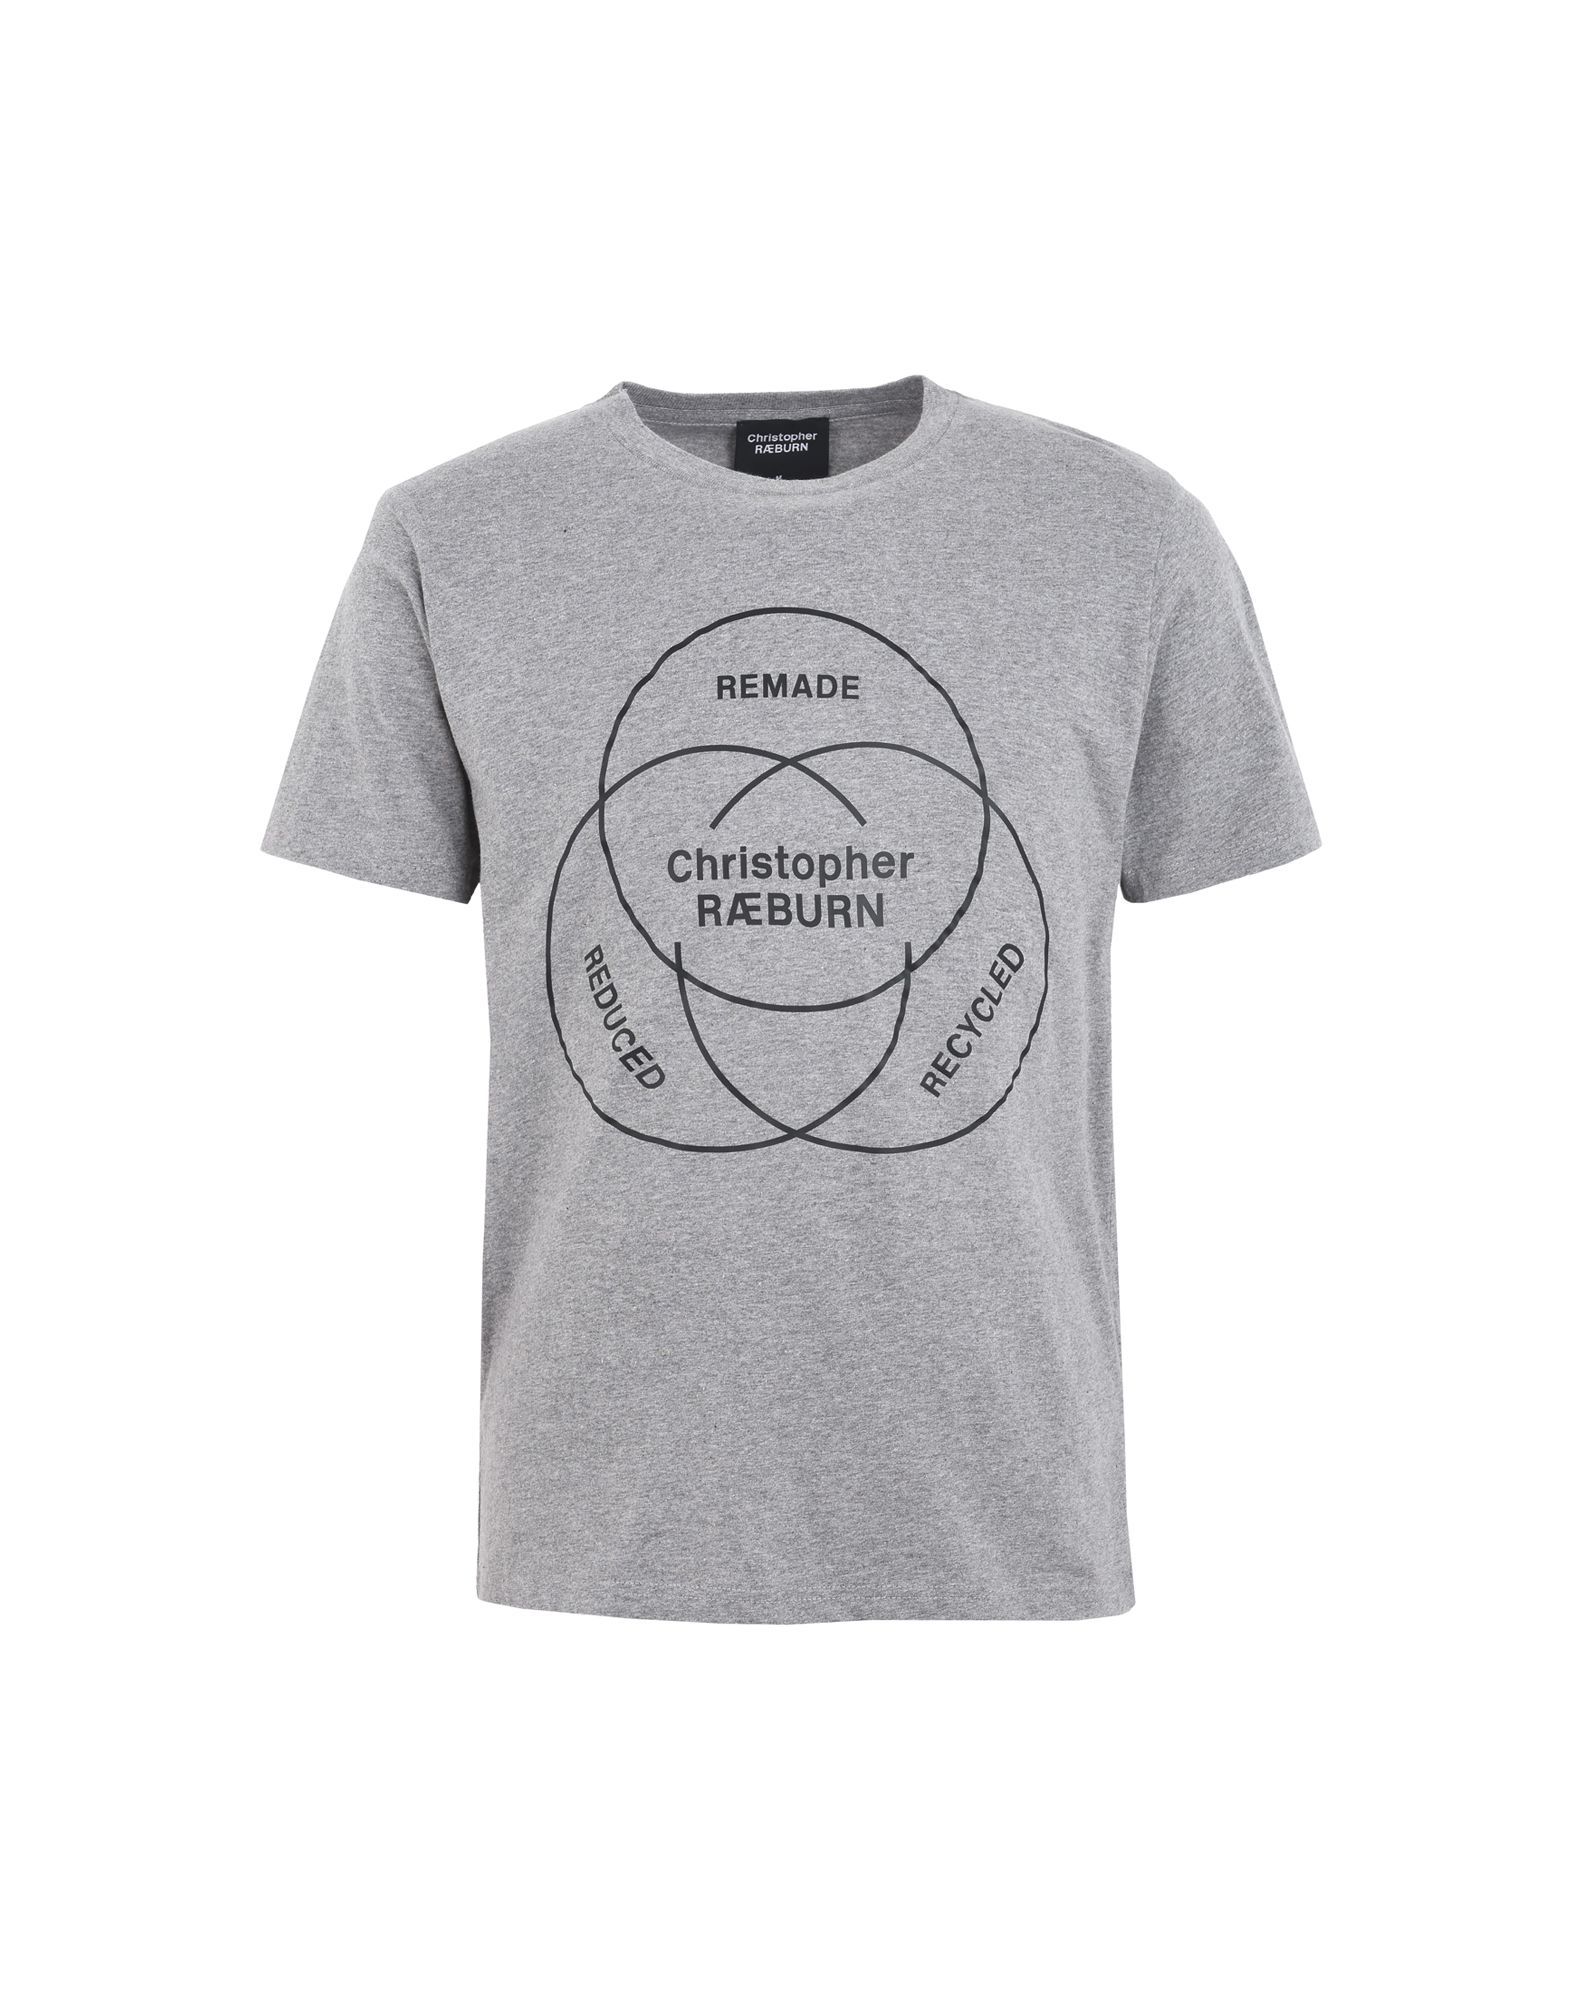 T-Shirt Christopher Uomo Raeburn Uomo Christopher - 12159748SE 56844b